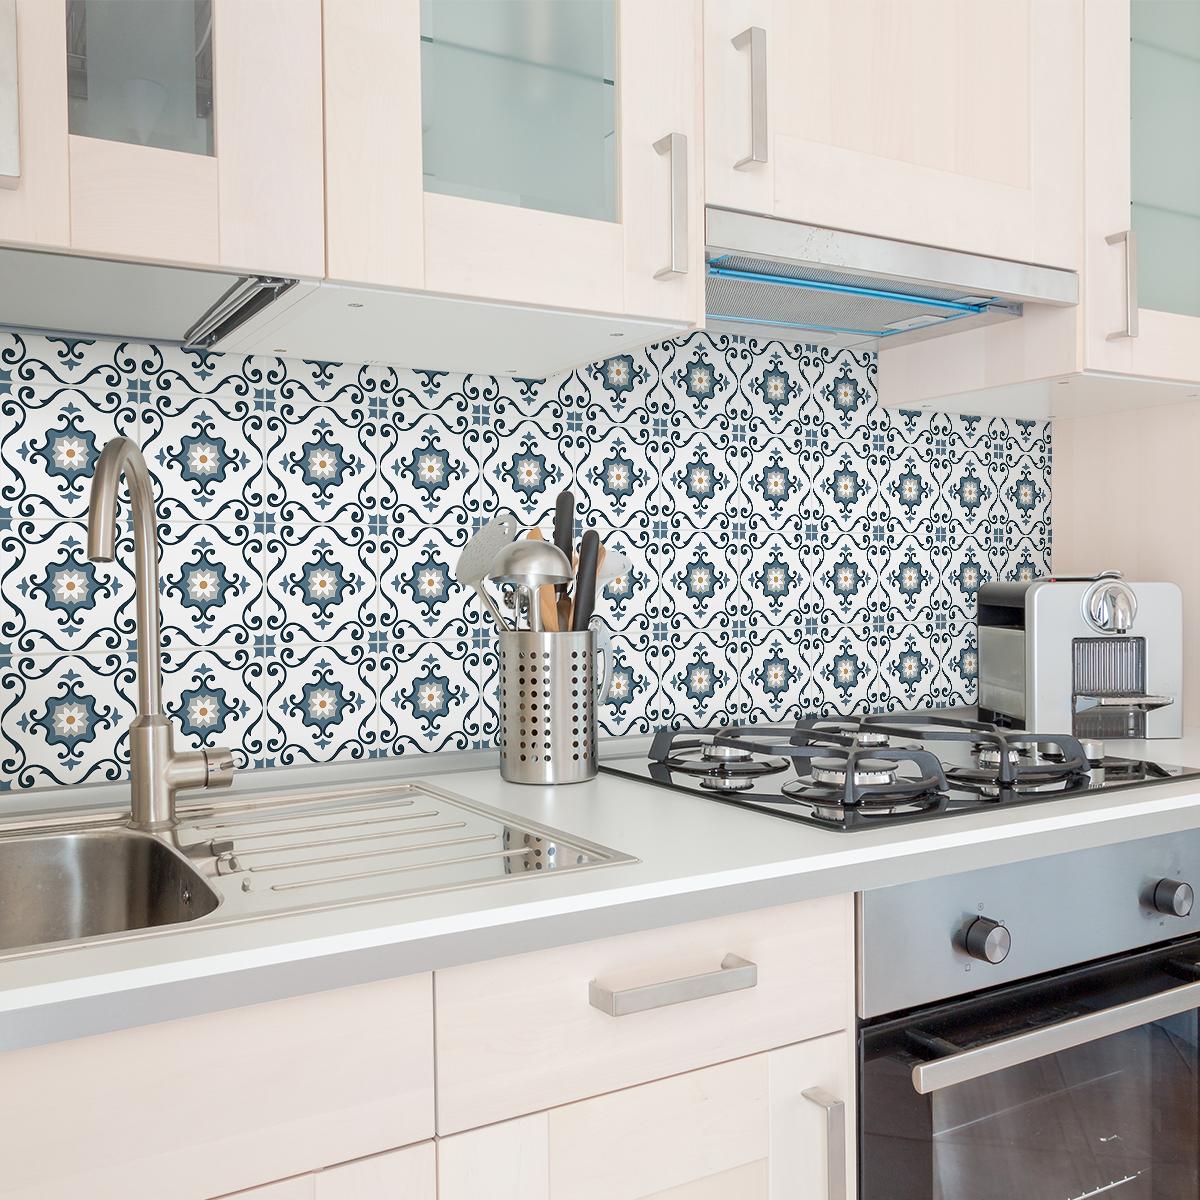 24 stickers carreaux de ciment azulejos c lina cuisine. Black Bedroom Furniture Sets. Home Design Ideas